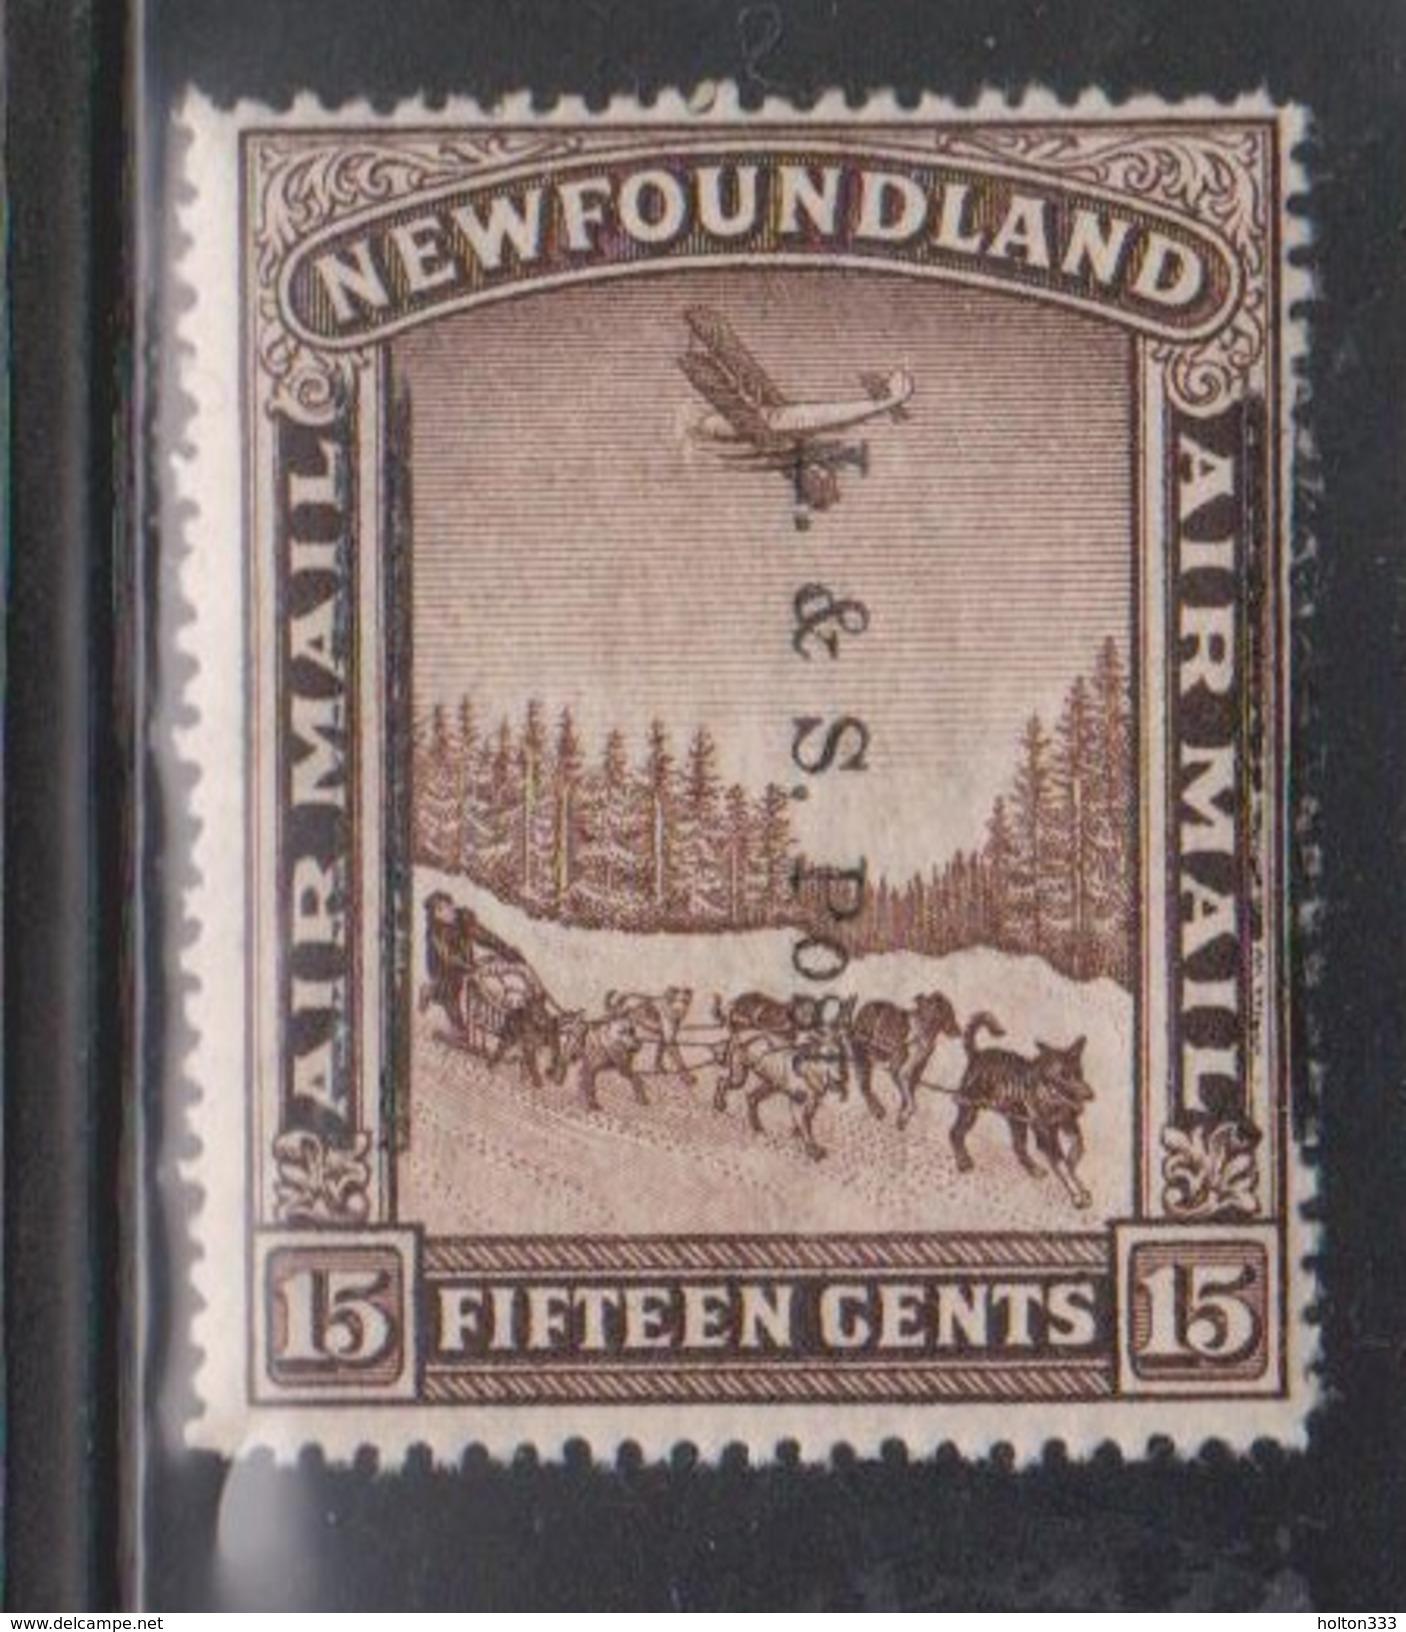 NEWFOUNDLAND Scott # 211 MNH - L & S Post Overprint On 15 Cent Airmail - Newfoundland